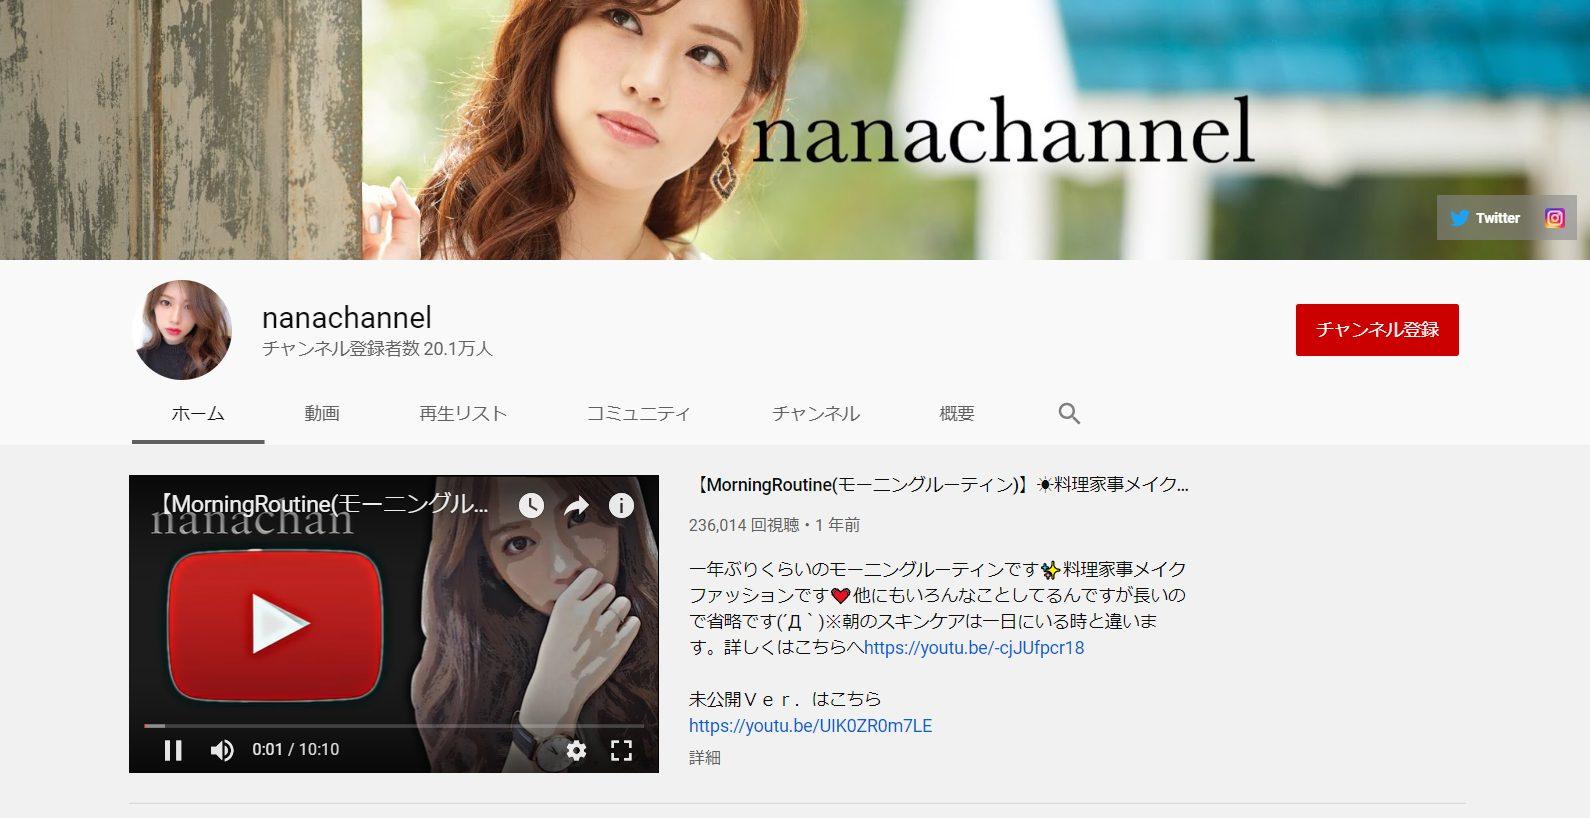 youtube-fashion-influencer-nanachannel